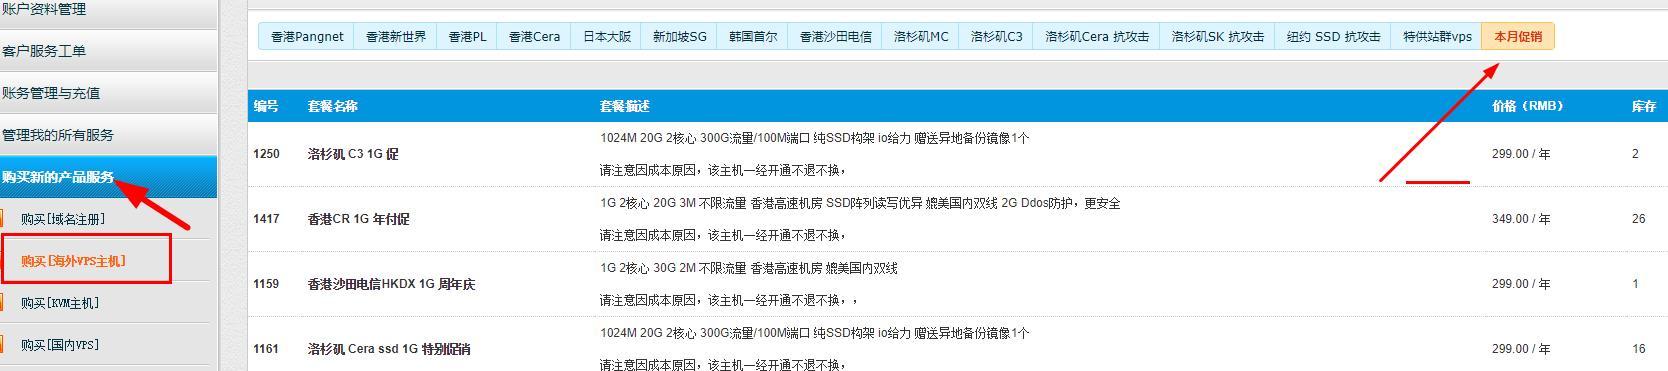 80VPS主机上线韩国VPS虚拟服务器特价年付套餐/1G内存/年付仅需299元-VPS推荐网